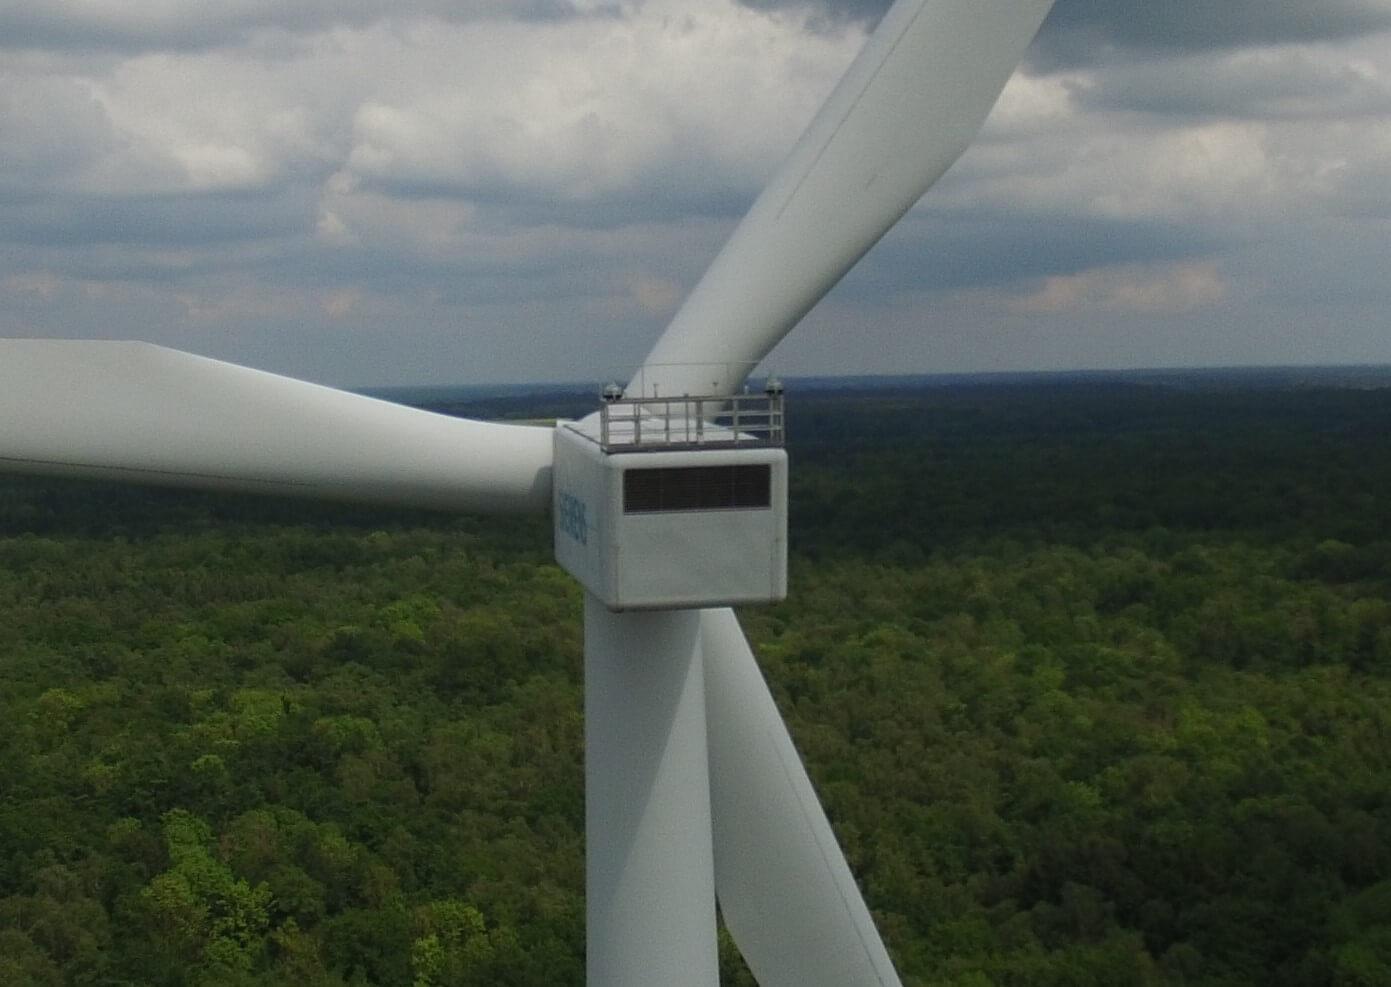 Windkraftanlage Siemens Luftbildperspektive